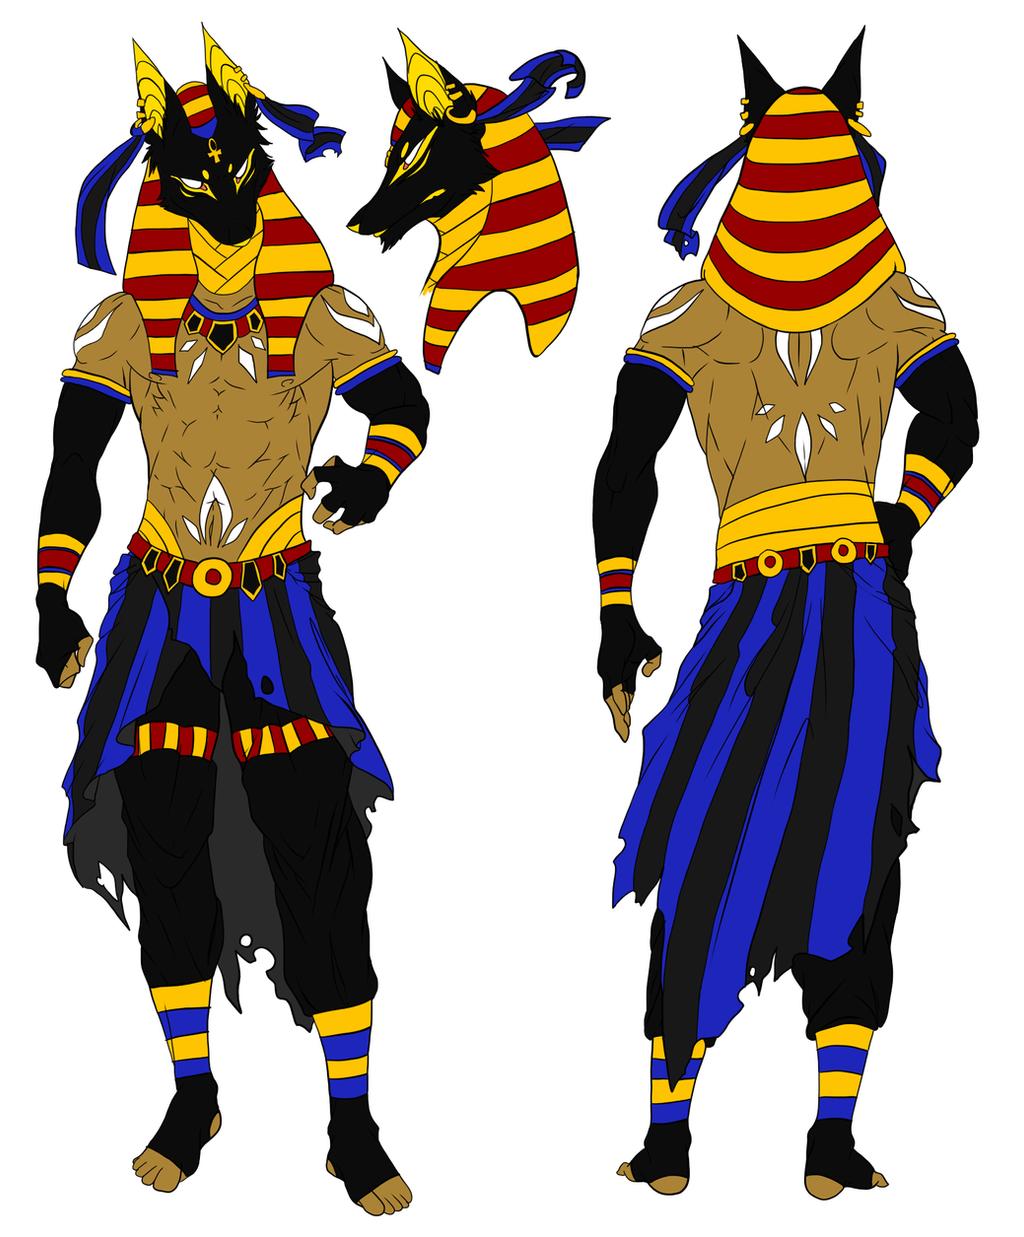 Egyptian God Anubis by iFierceFang on DeviantArt